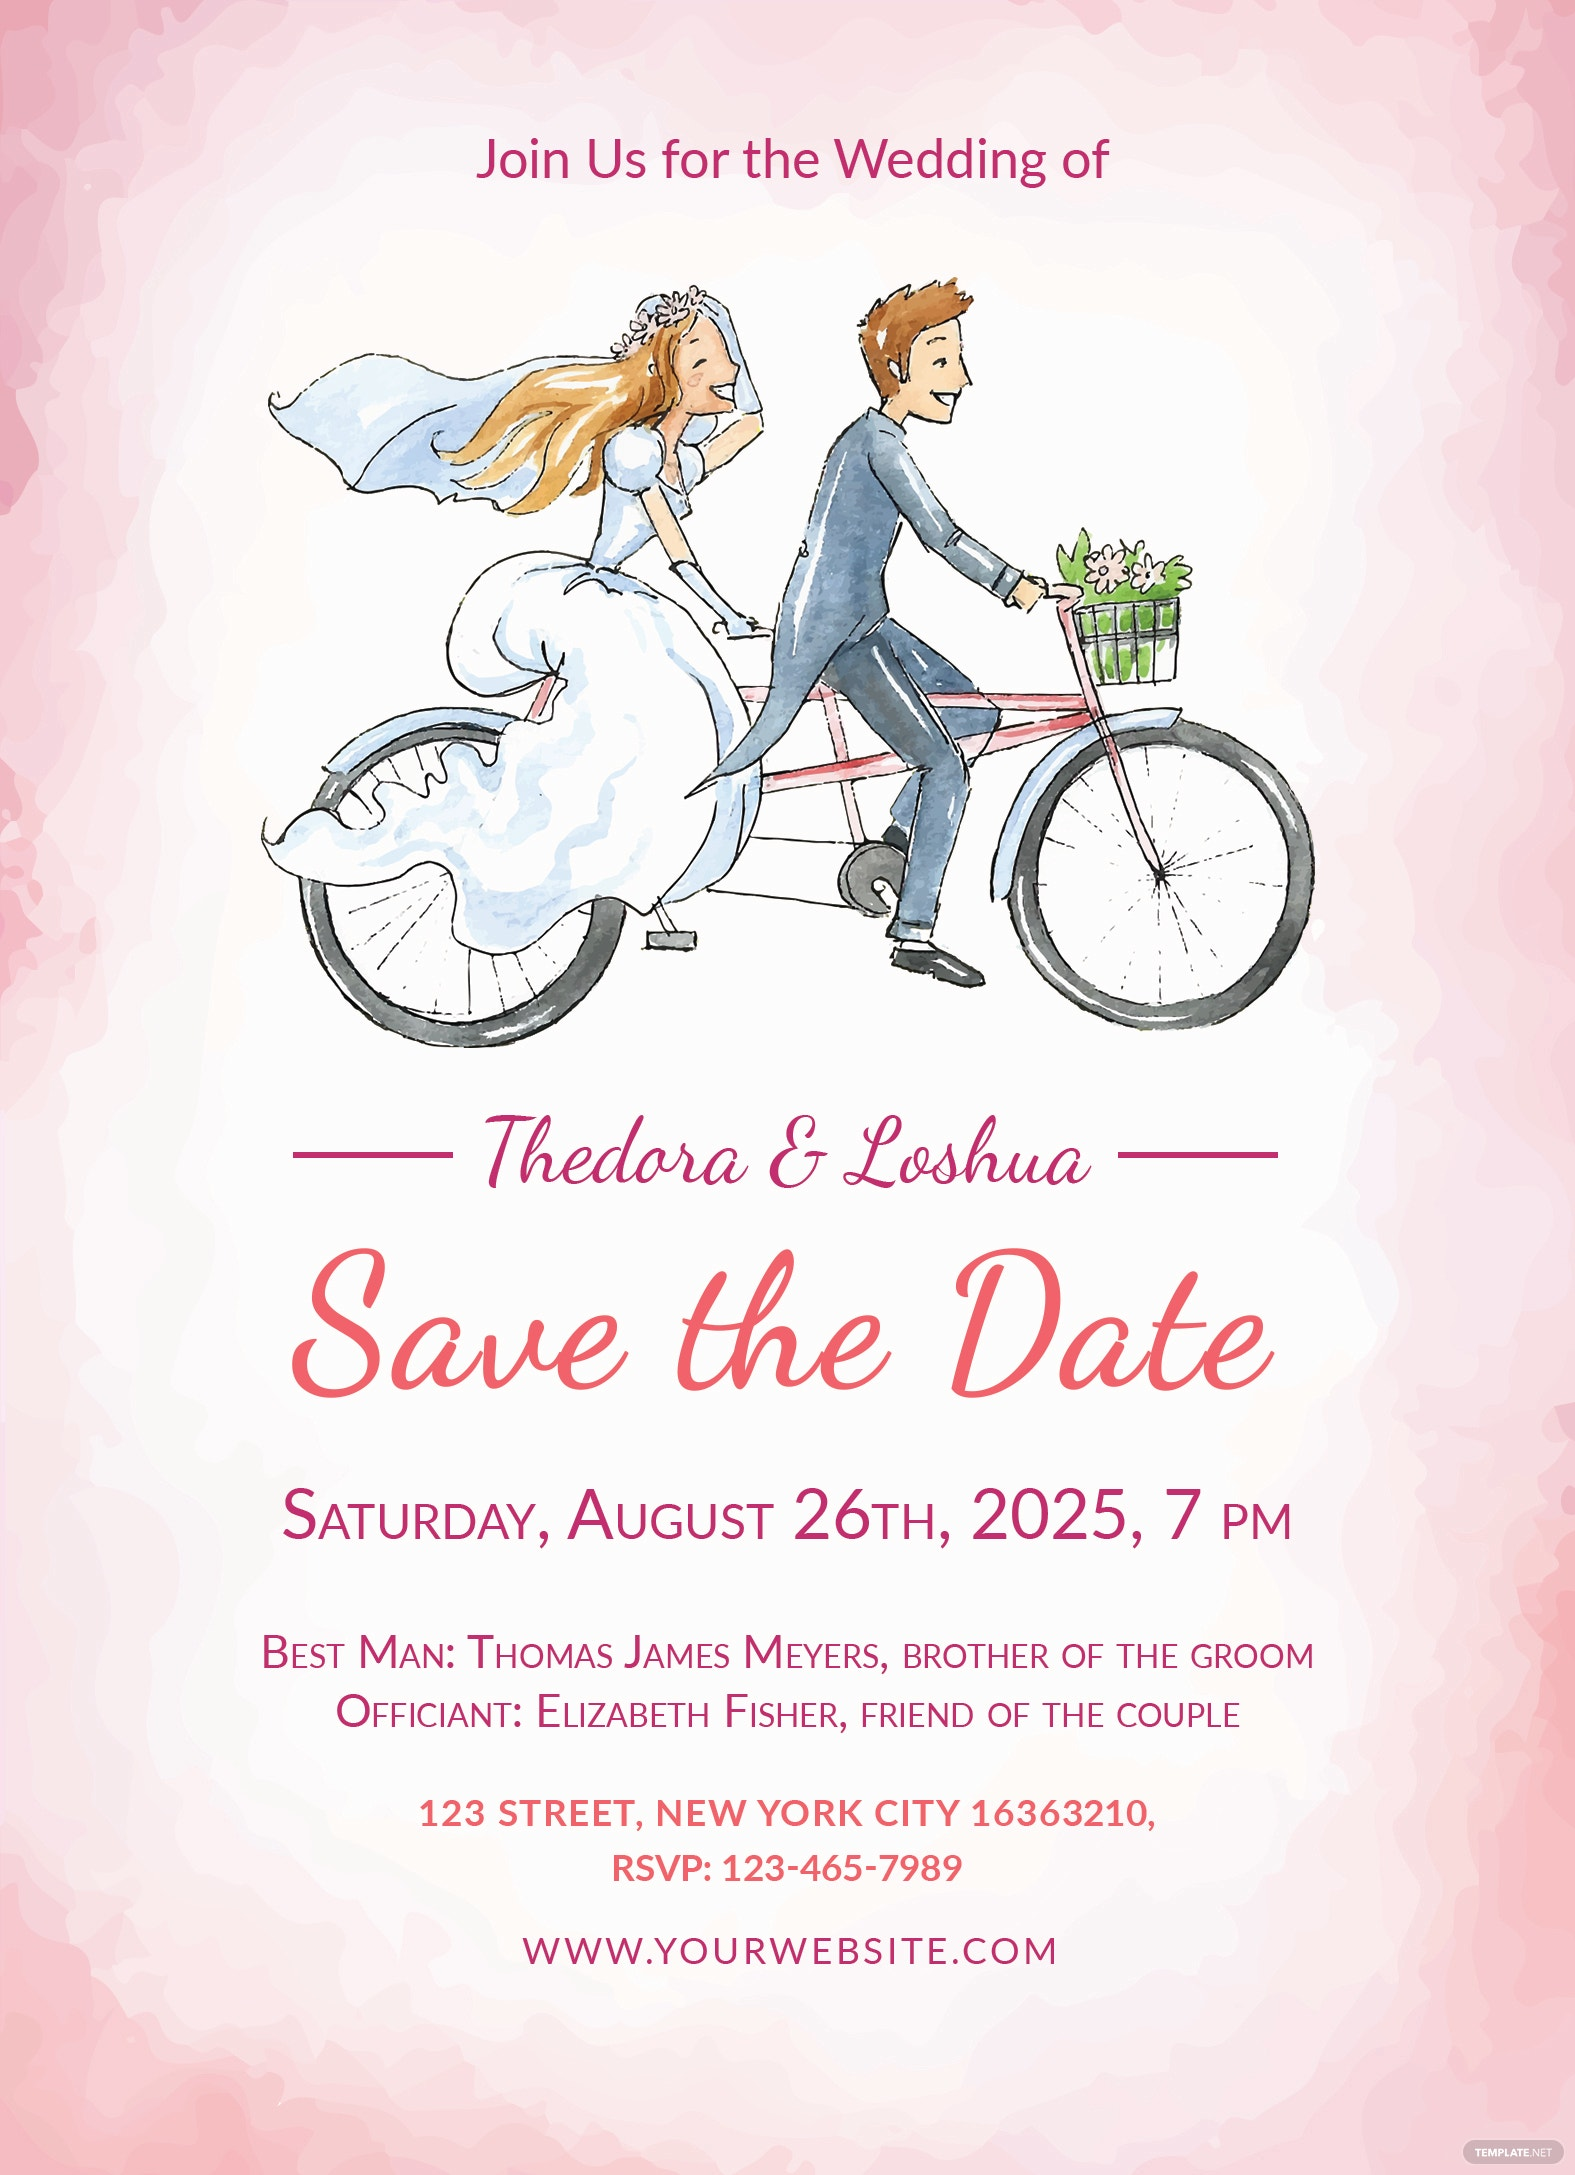 Simple Wedding Invitation Template in Adobe Photoshop, Illustrator ...